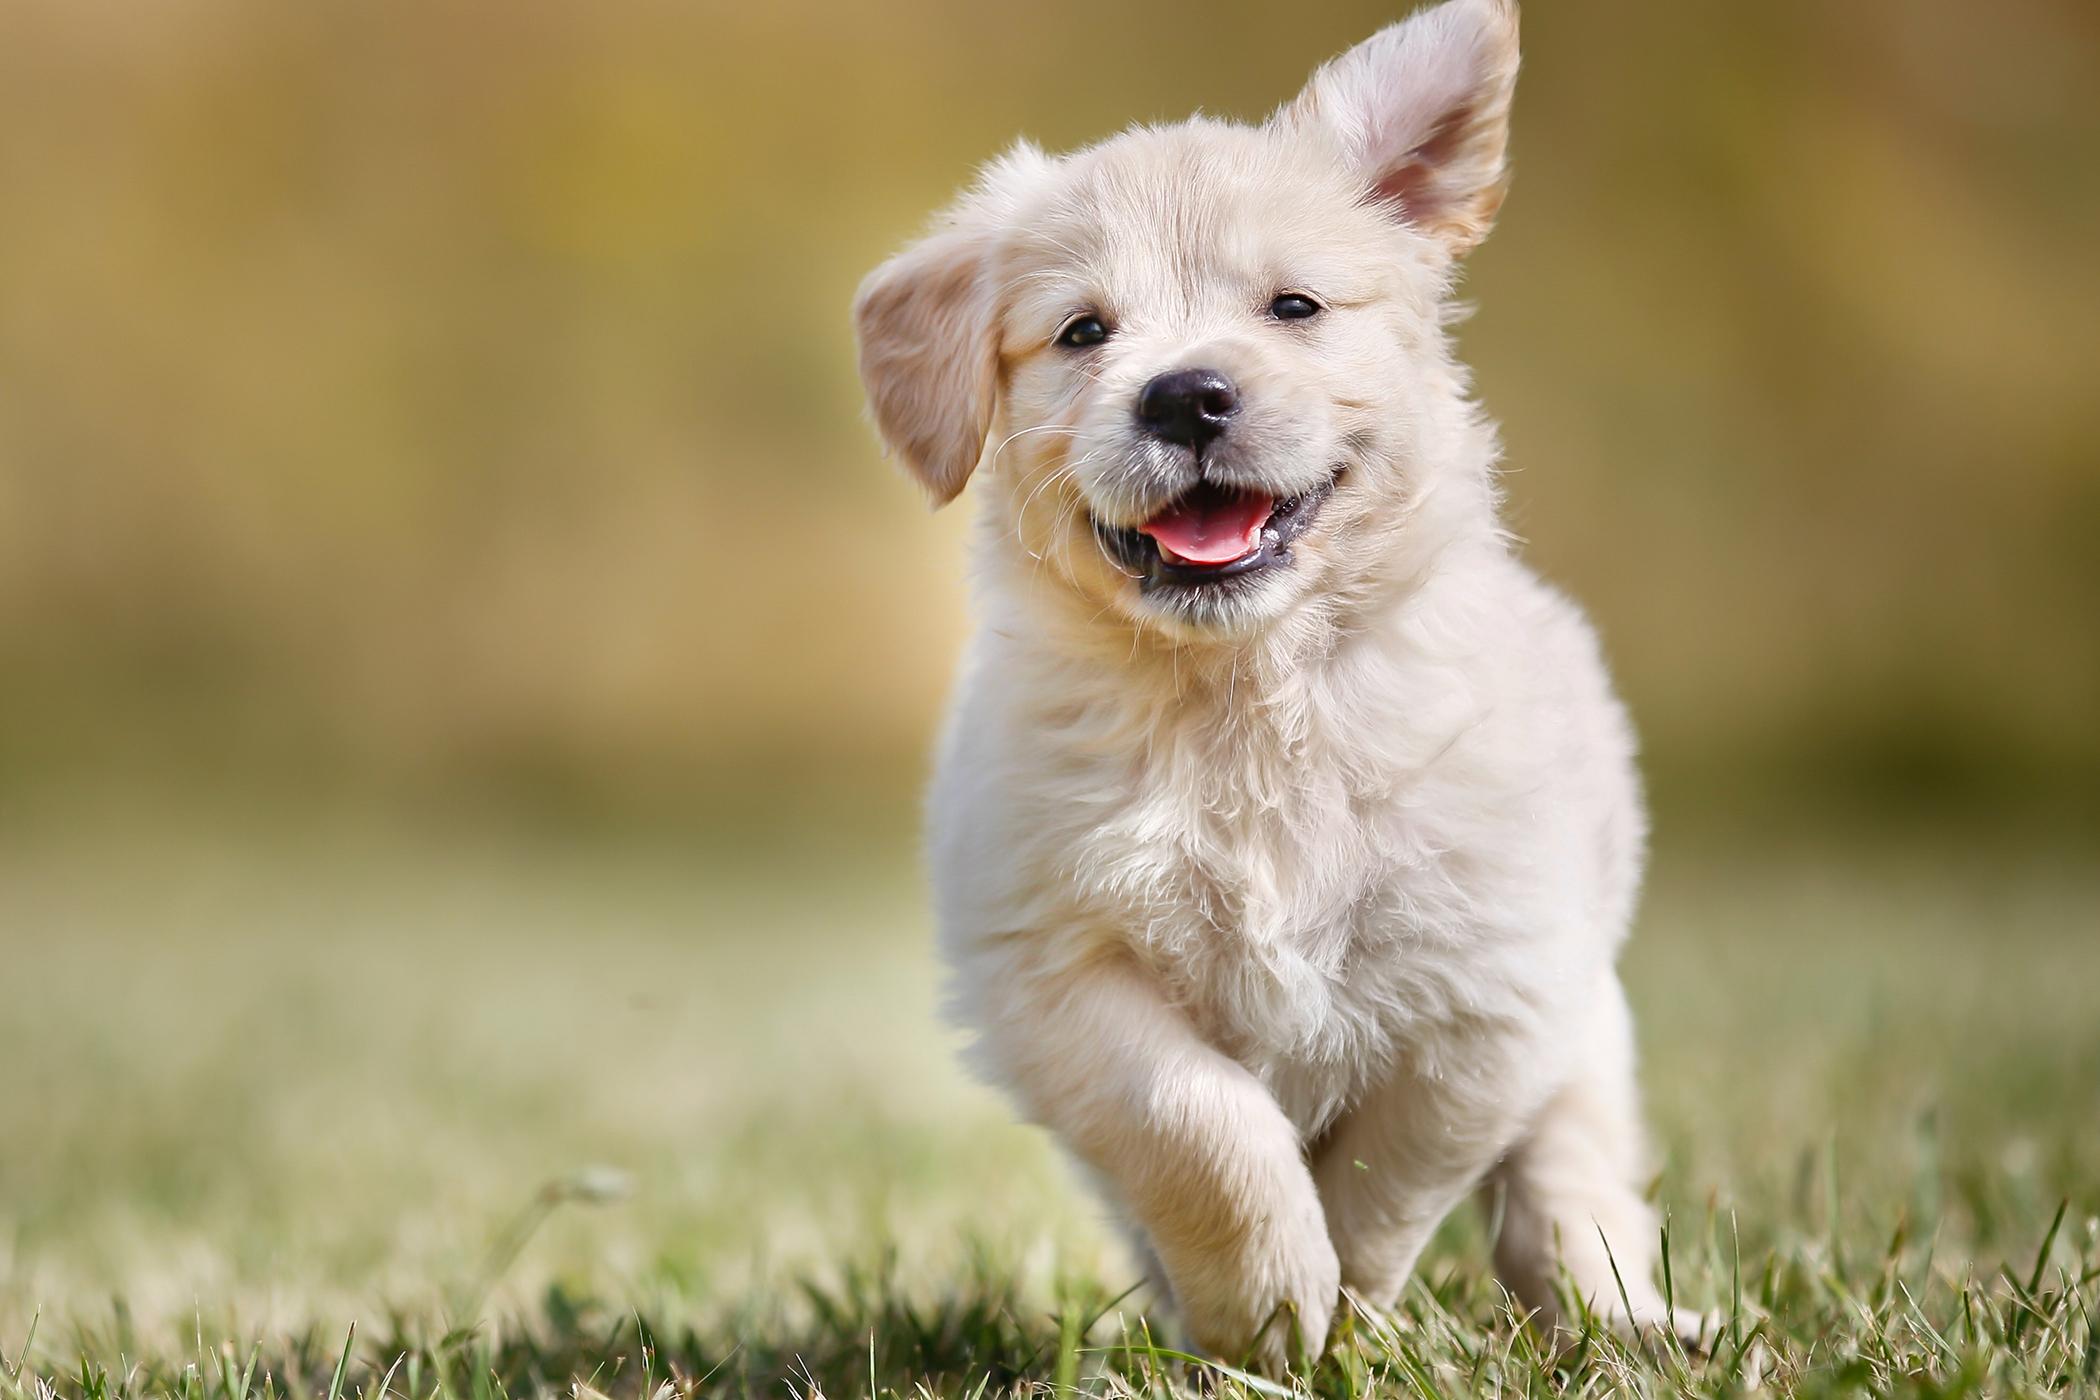 dog neutering cost on benefits